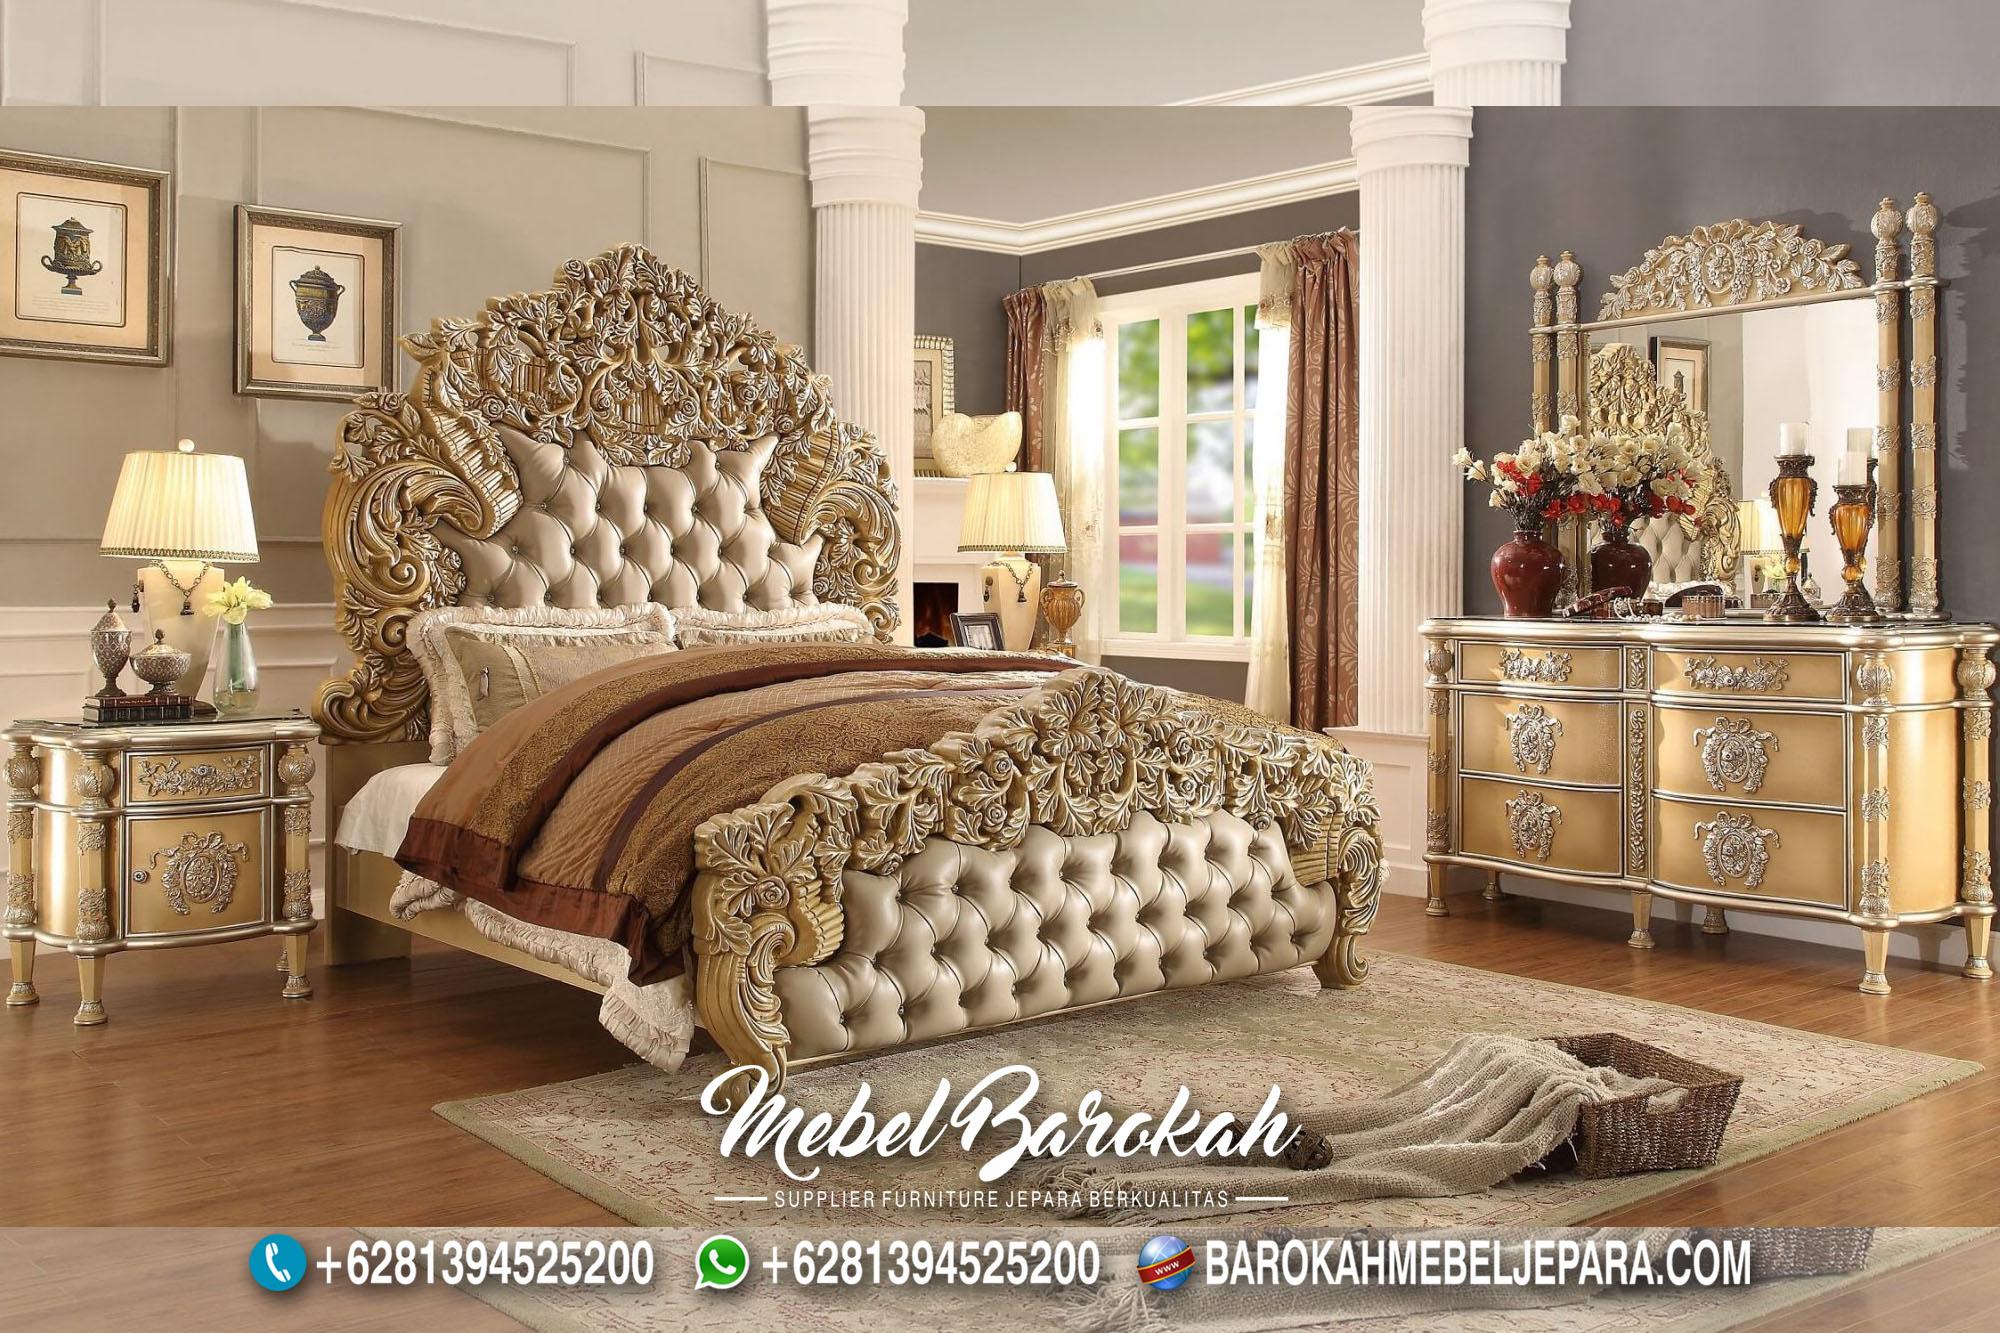 New Bedroom Set Desain Victorian Casual MB-702